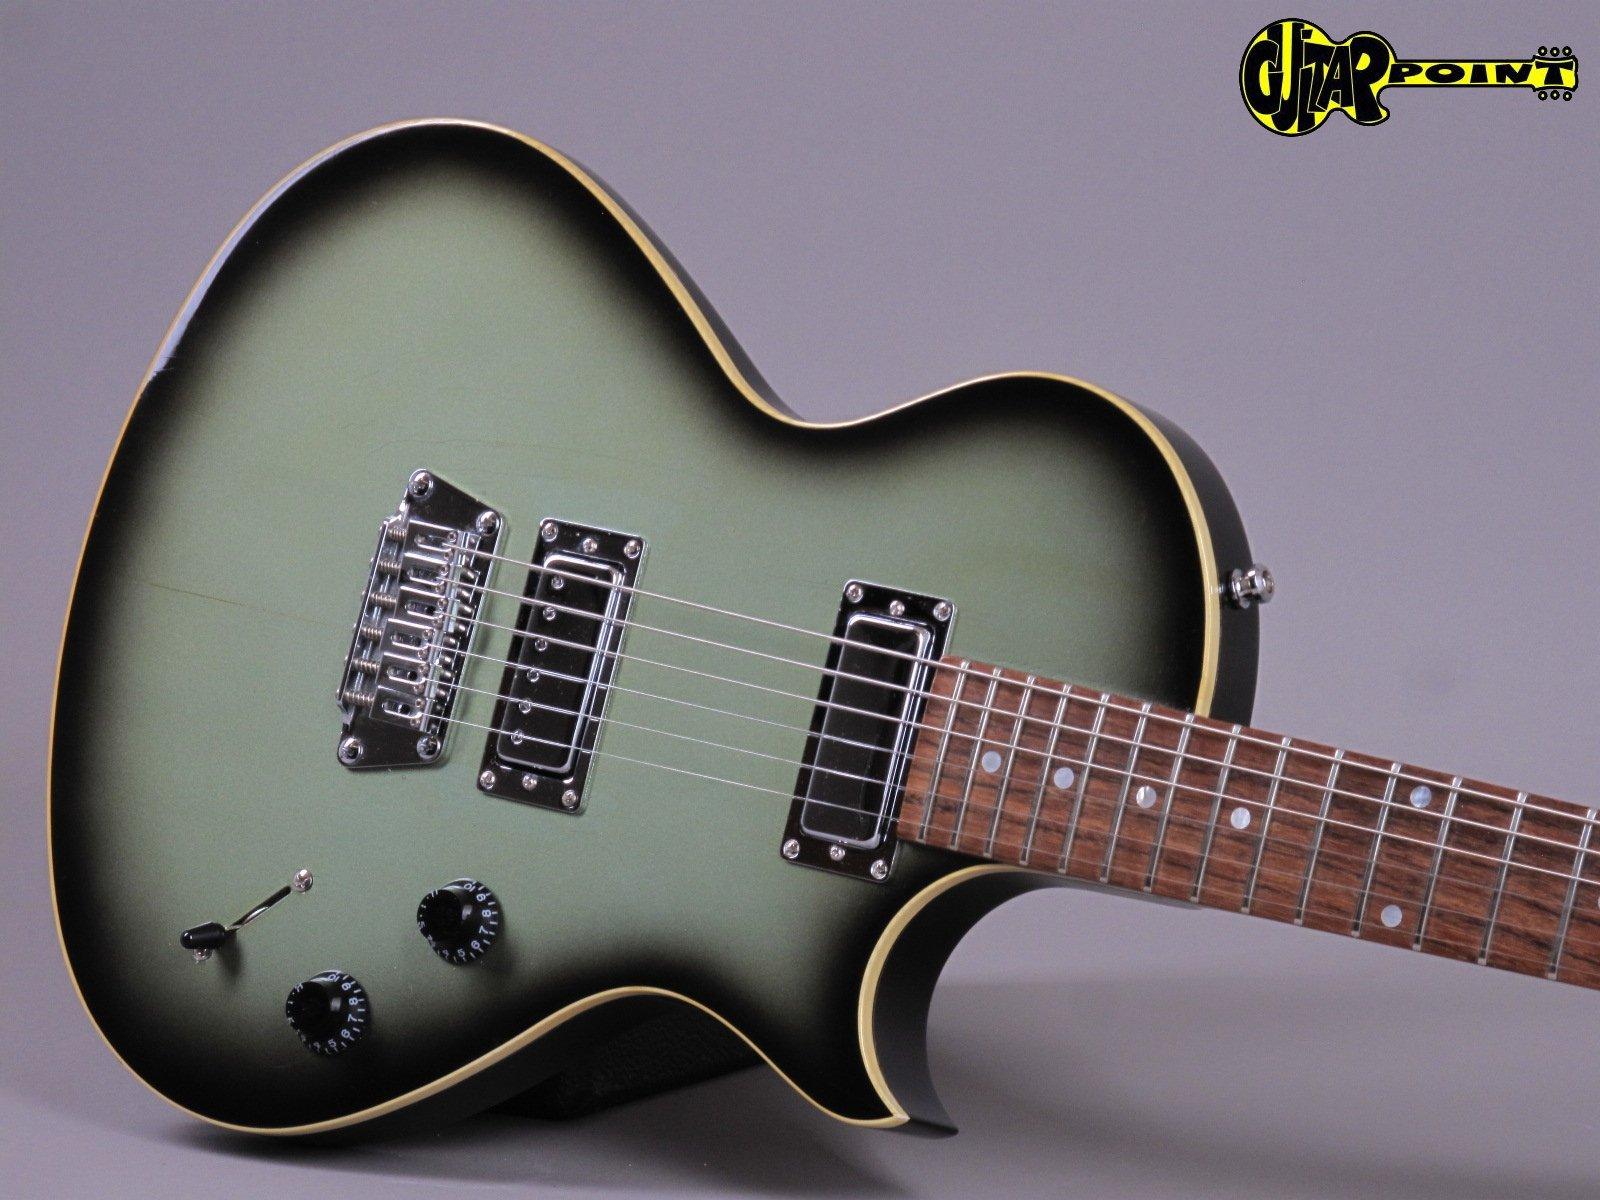 https://guitarpoint.de/app/uploads/products/1996-gibson-nighthawk-ltd-landmark-series-navajo-turquoise/Gibson96NightHNavTqs92196444_19.jpg